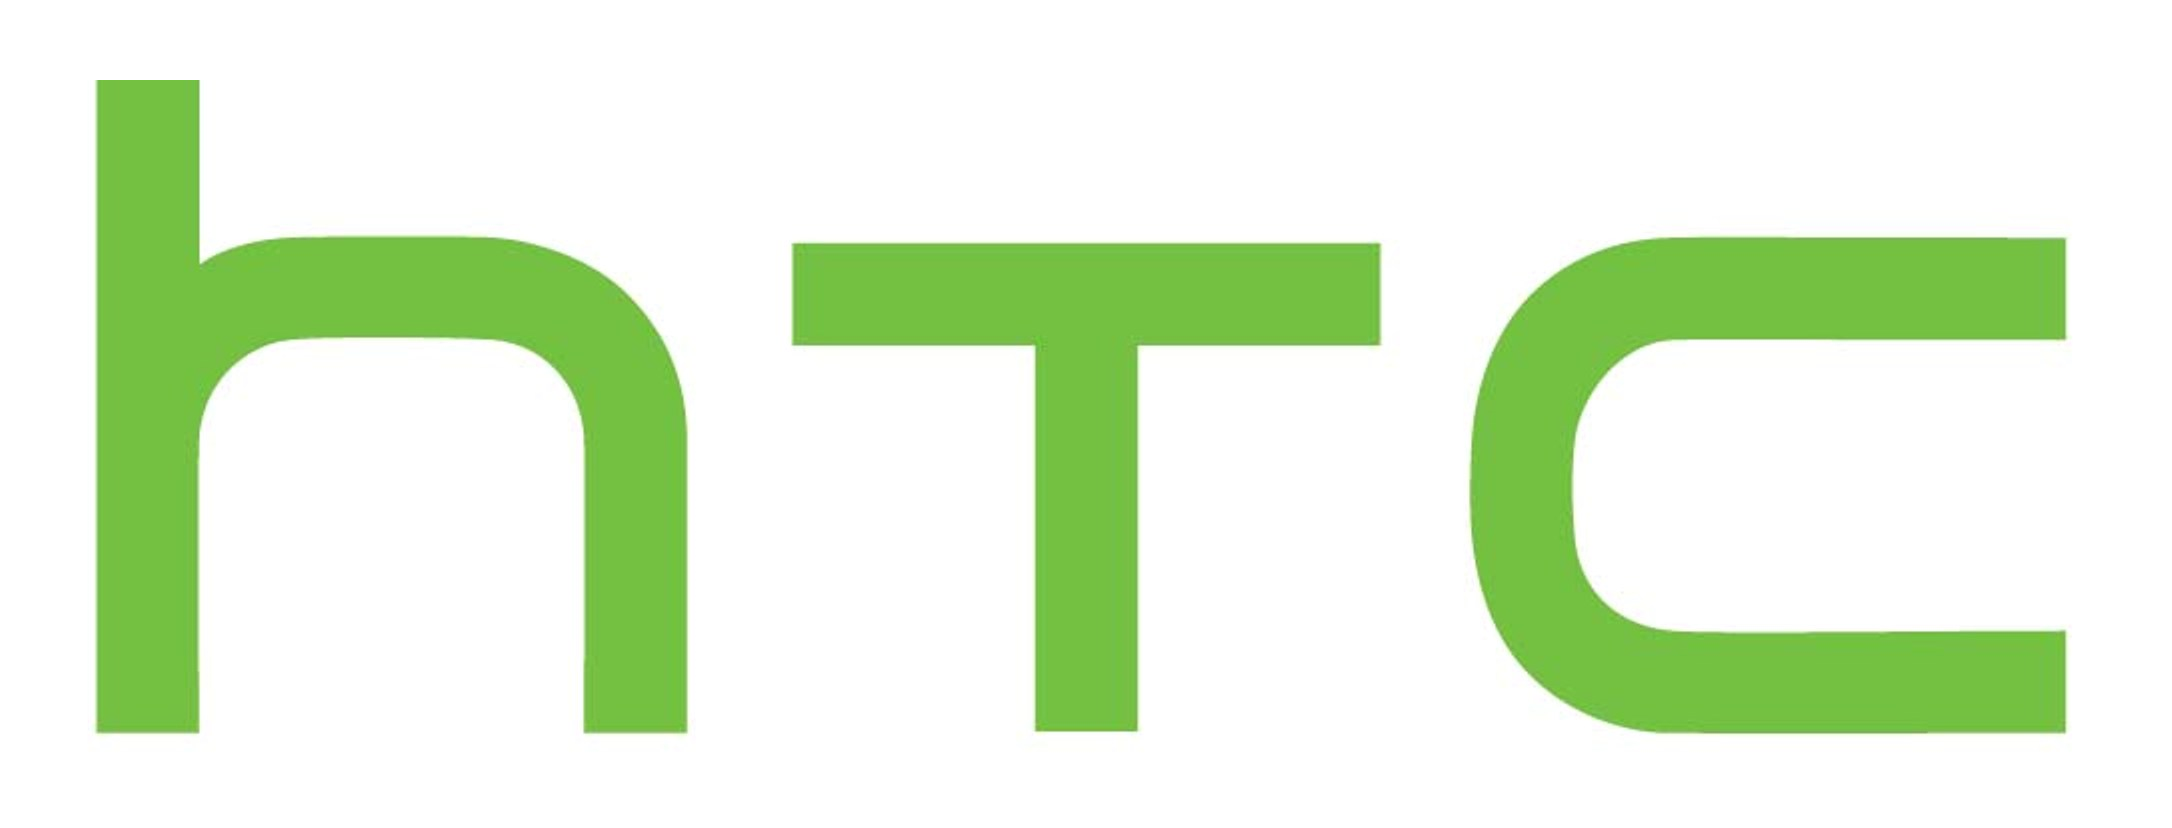 htc logo png #427